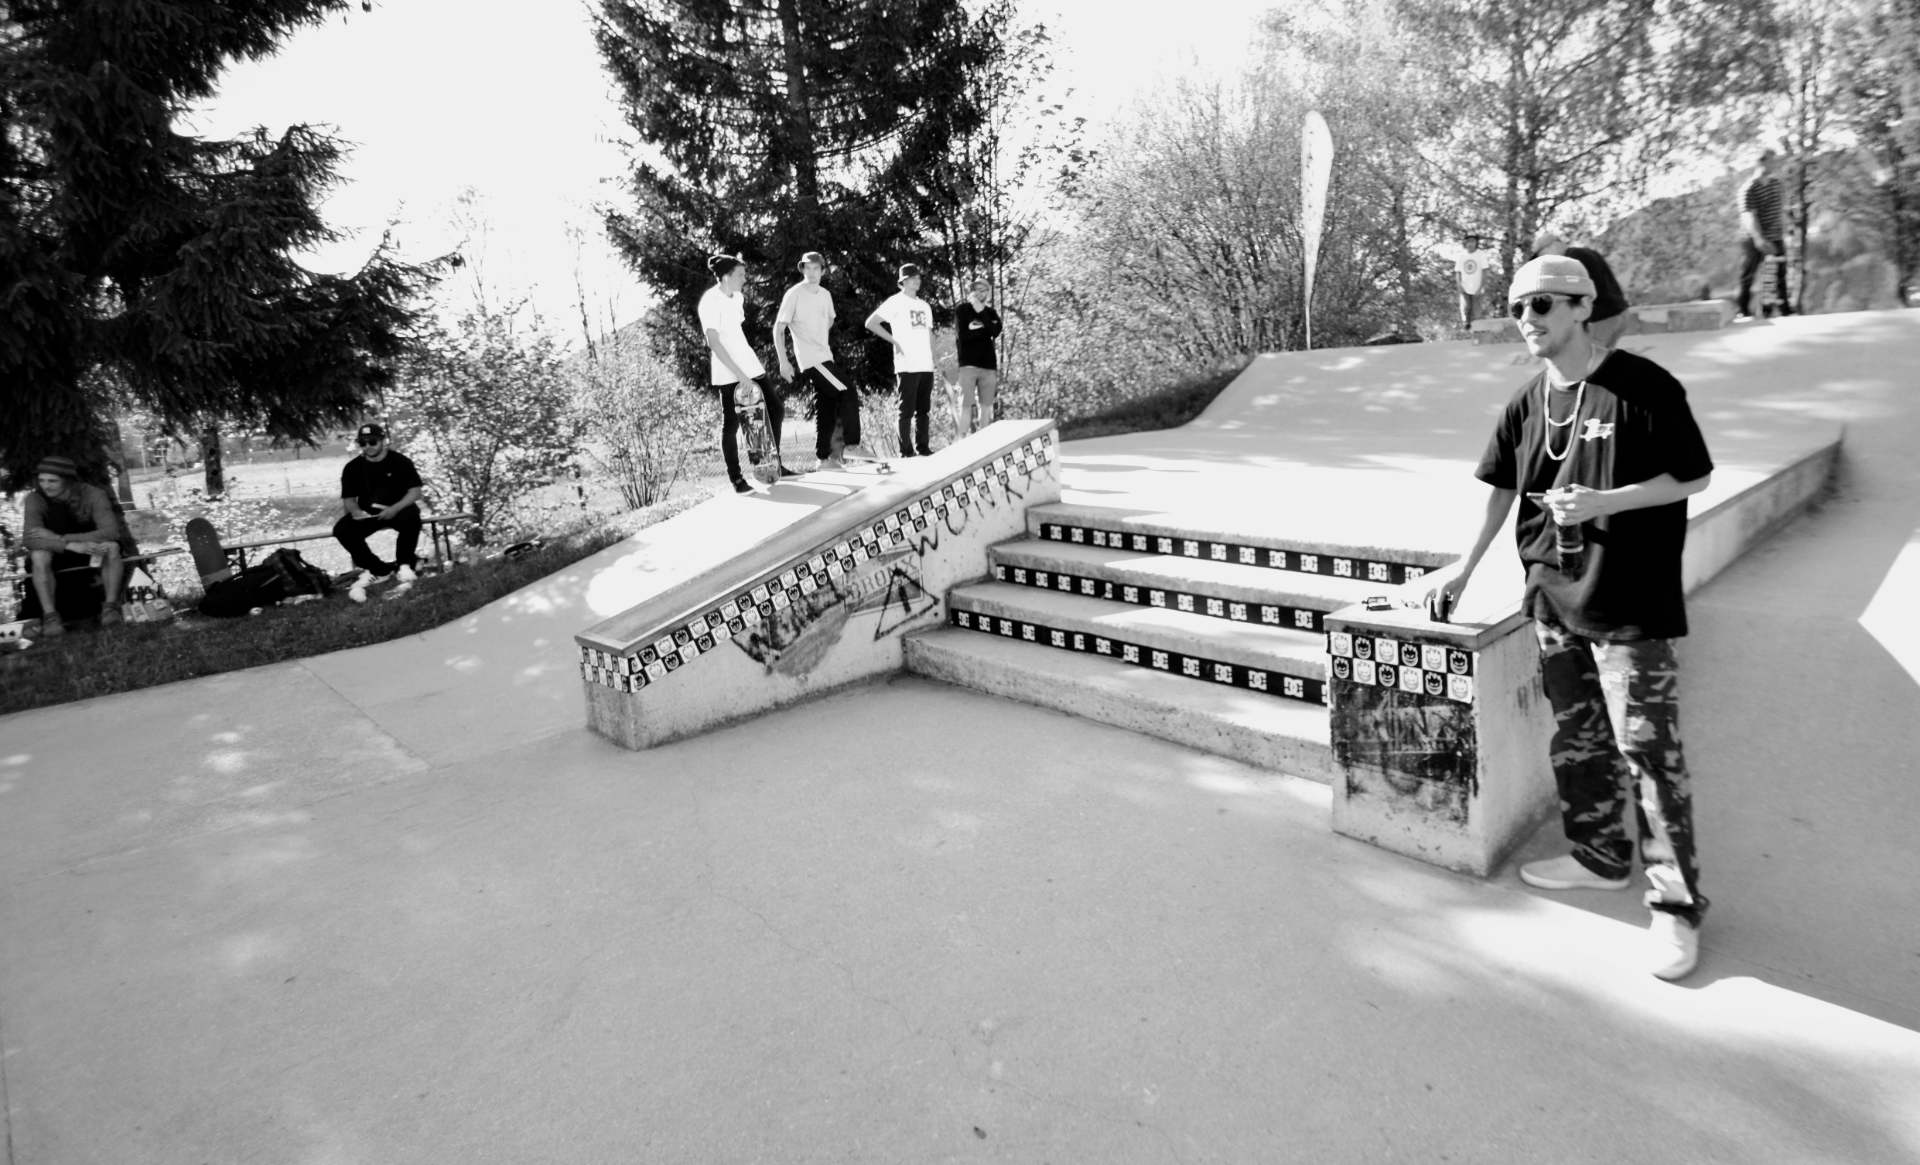 skateboard headz fieberbrunn kgt kitz gau trophy 2019 saalfelden insta00009